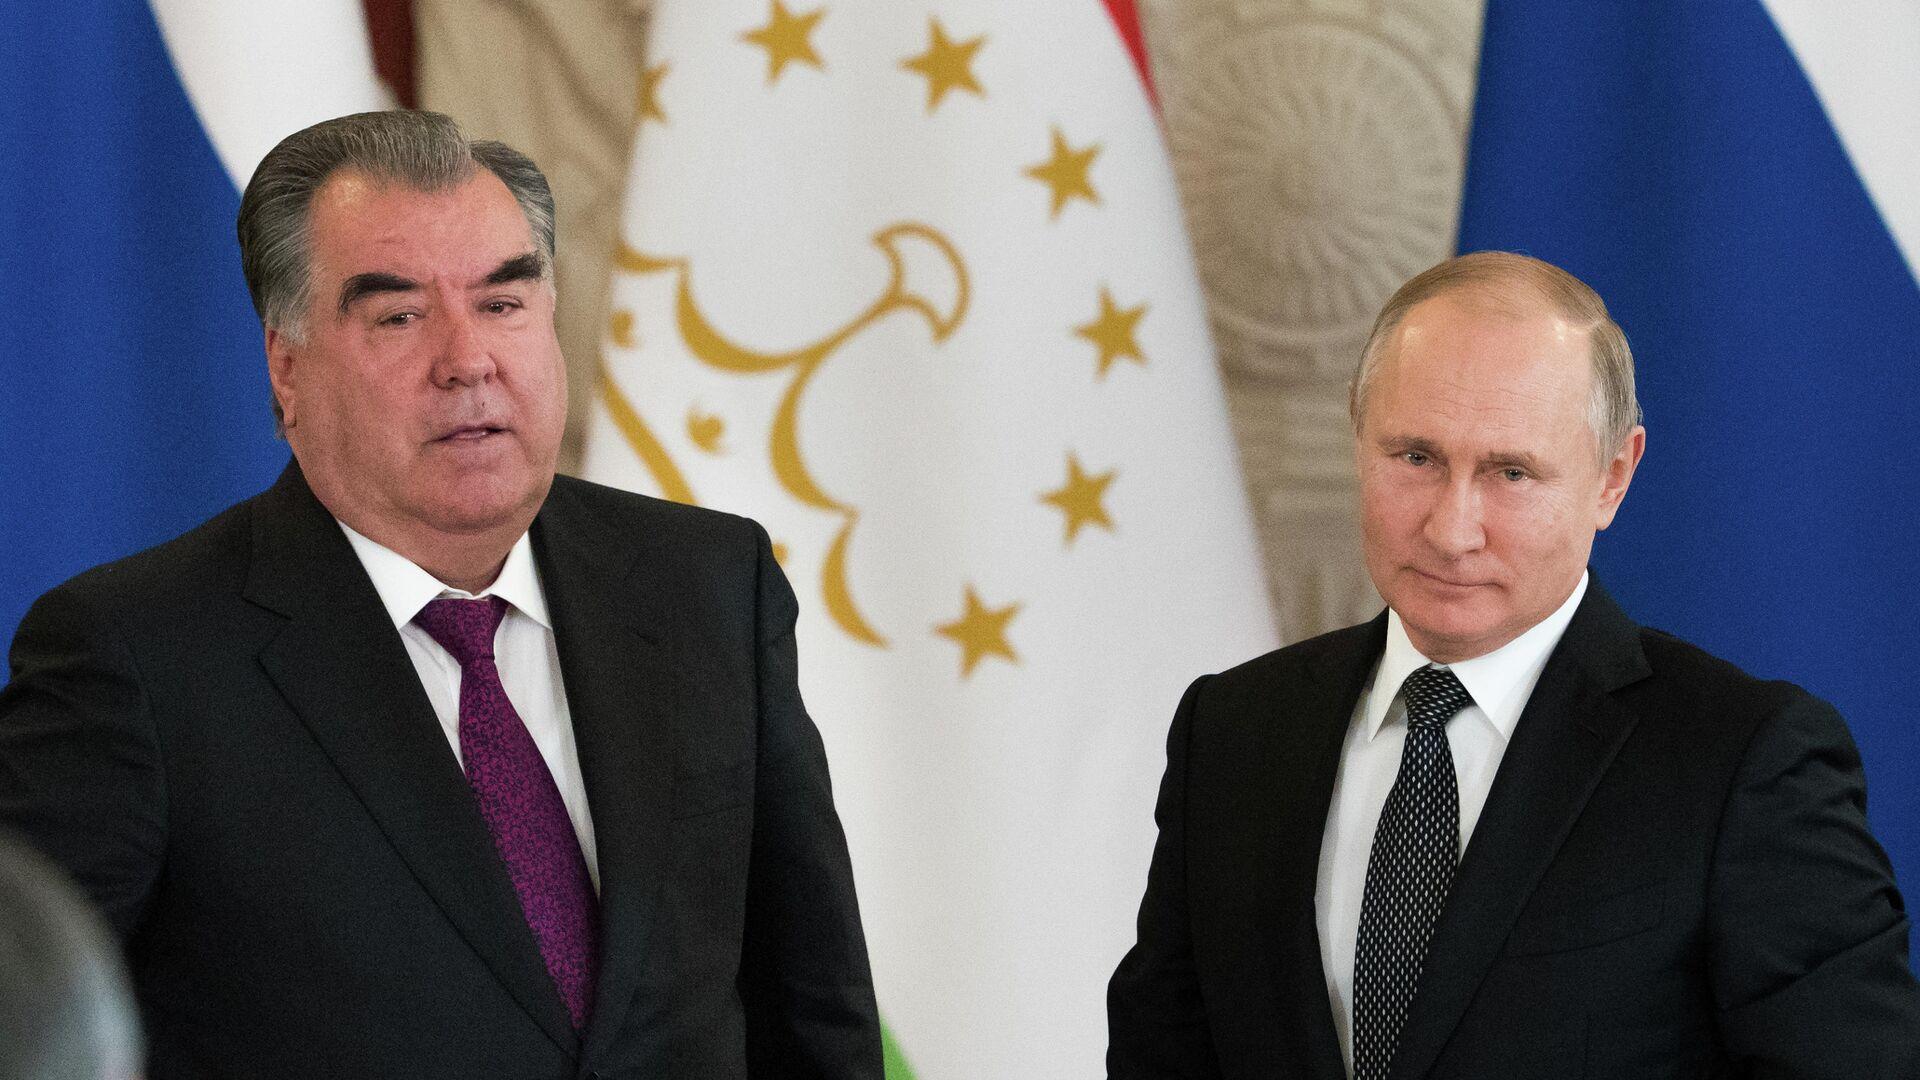 Президент РФ Владимир Путин и президент Таджикистана Эмомали Рахмон во время встречи. 17 апреля 2019 - РИА Новости, 1920, 22.07.2021